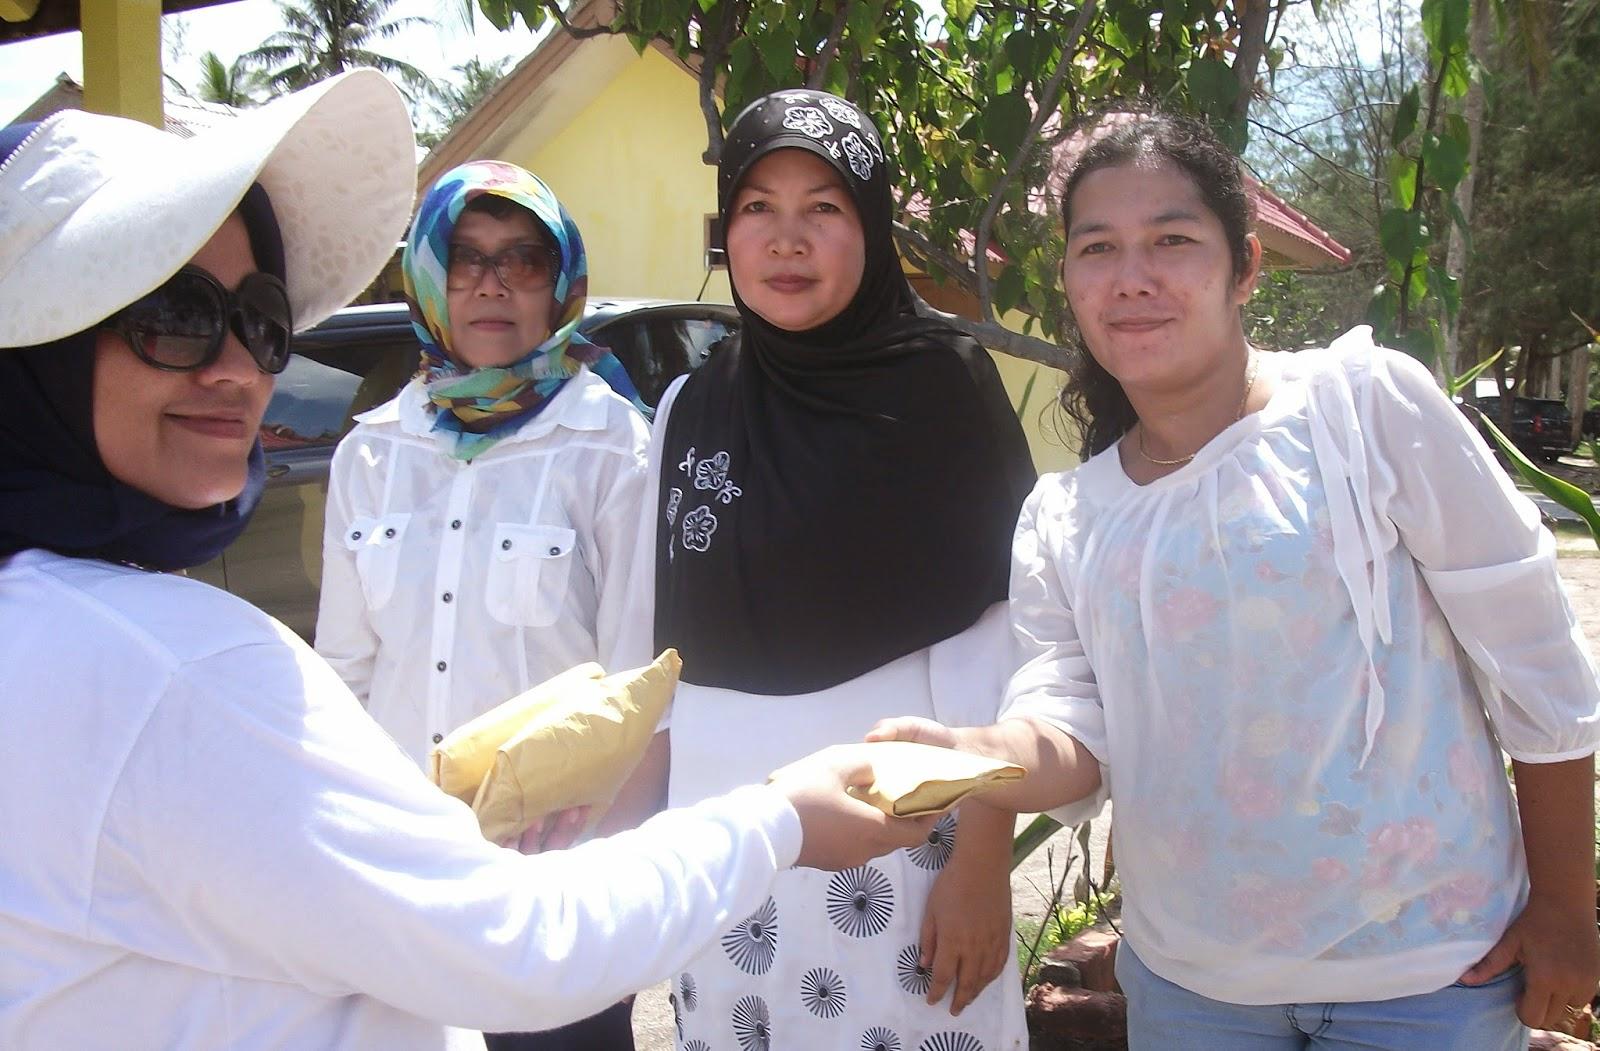 koperasi perempuan peduli kota tanjungpinang, dinas koperasi tanjungpinang kota tanjung pinang, hari ulang tahun koperasi, koperasi wanita tanjung pinang